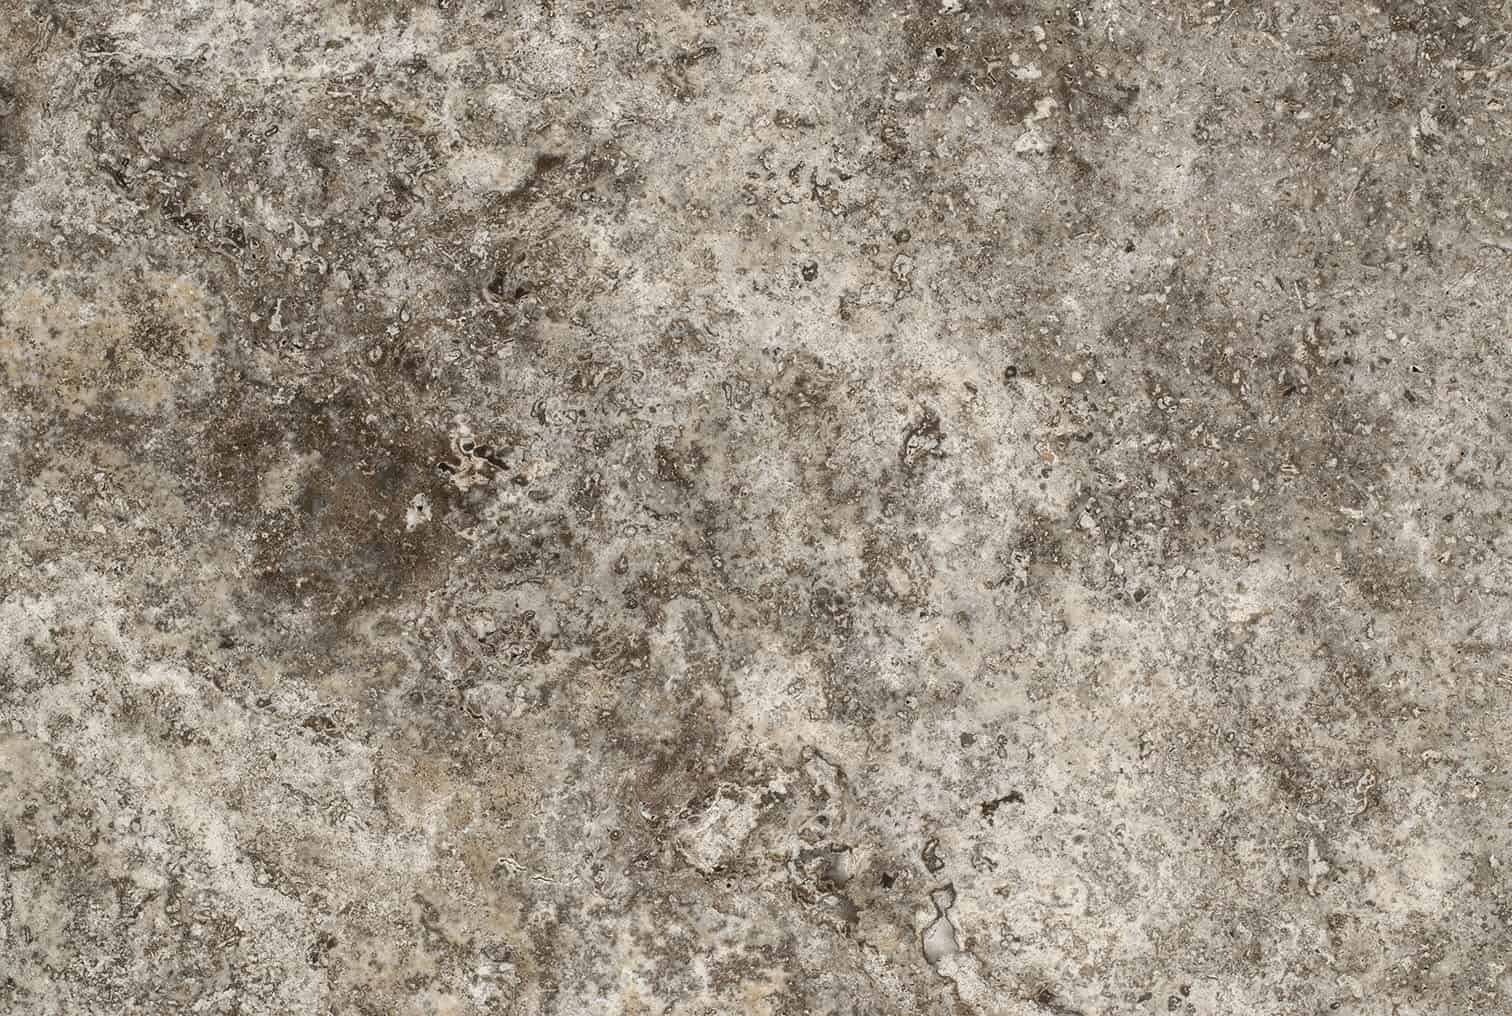 travertino-turco-silver-gris-plata-plateado-cross-cut.jpg